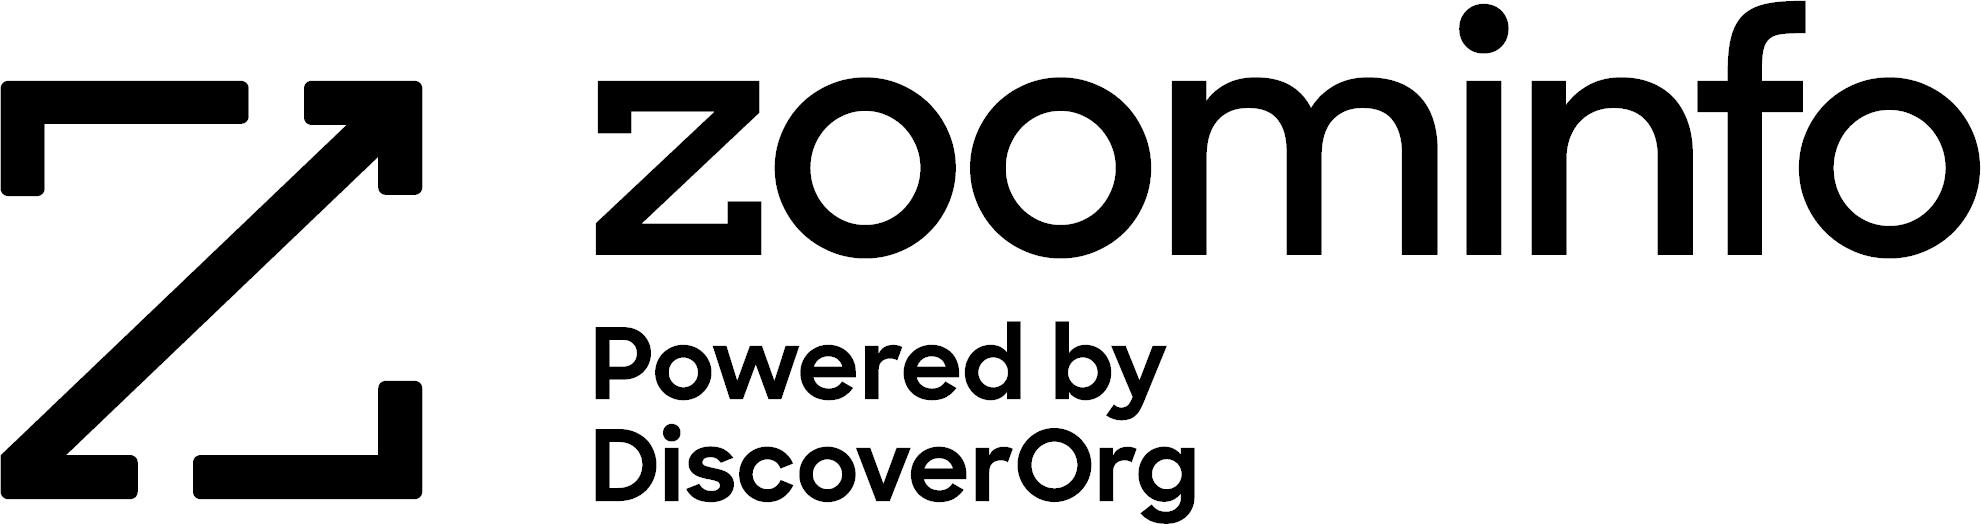 https://cdn.kscope.io/8bd017890557b41fb8ed117d45bce4b8-zoominfologo1b.jpg